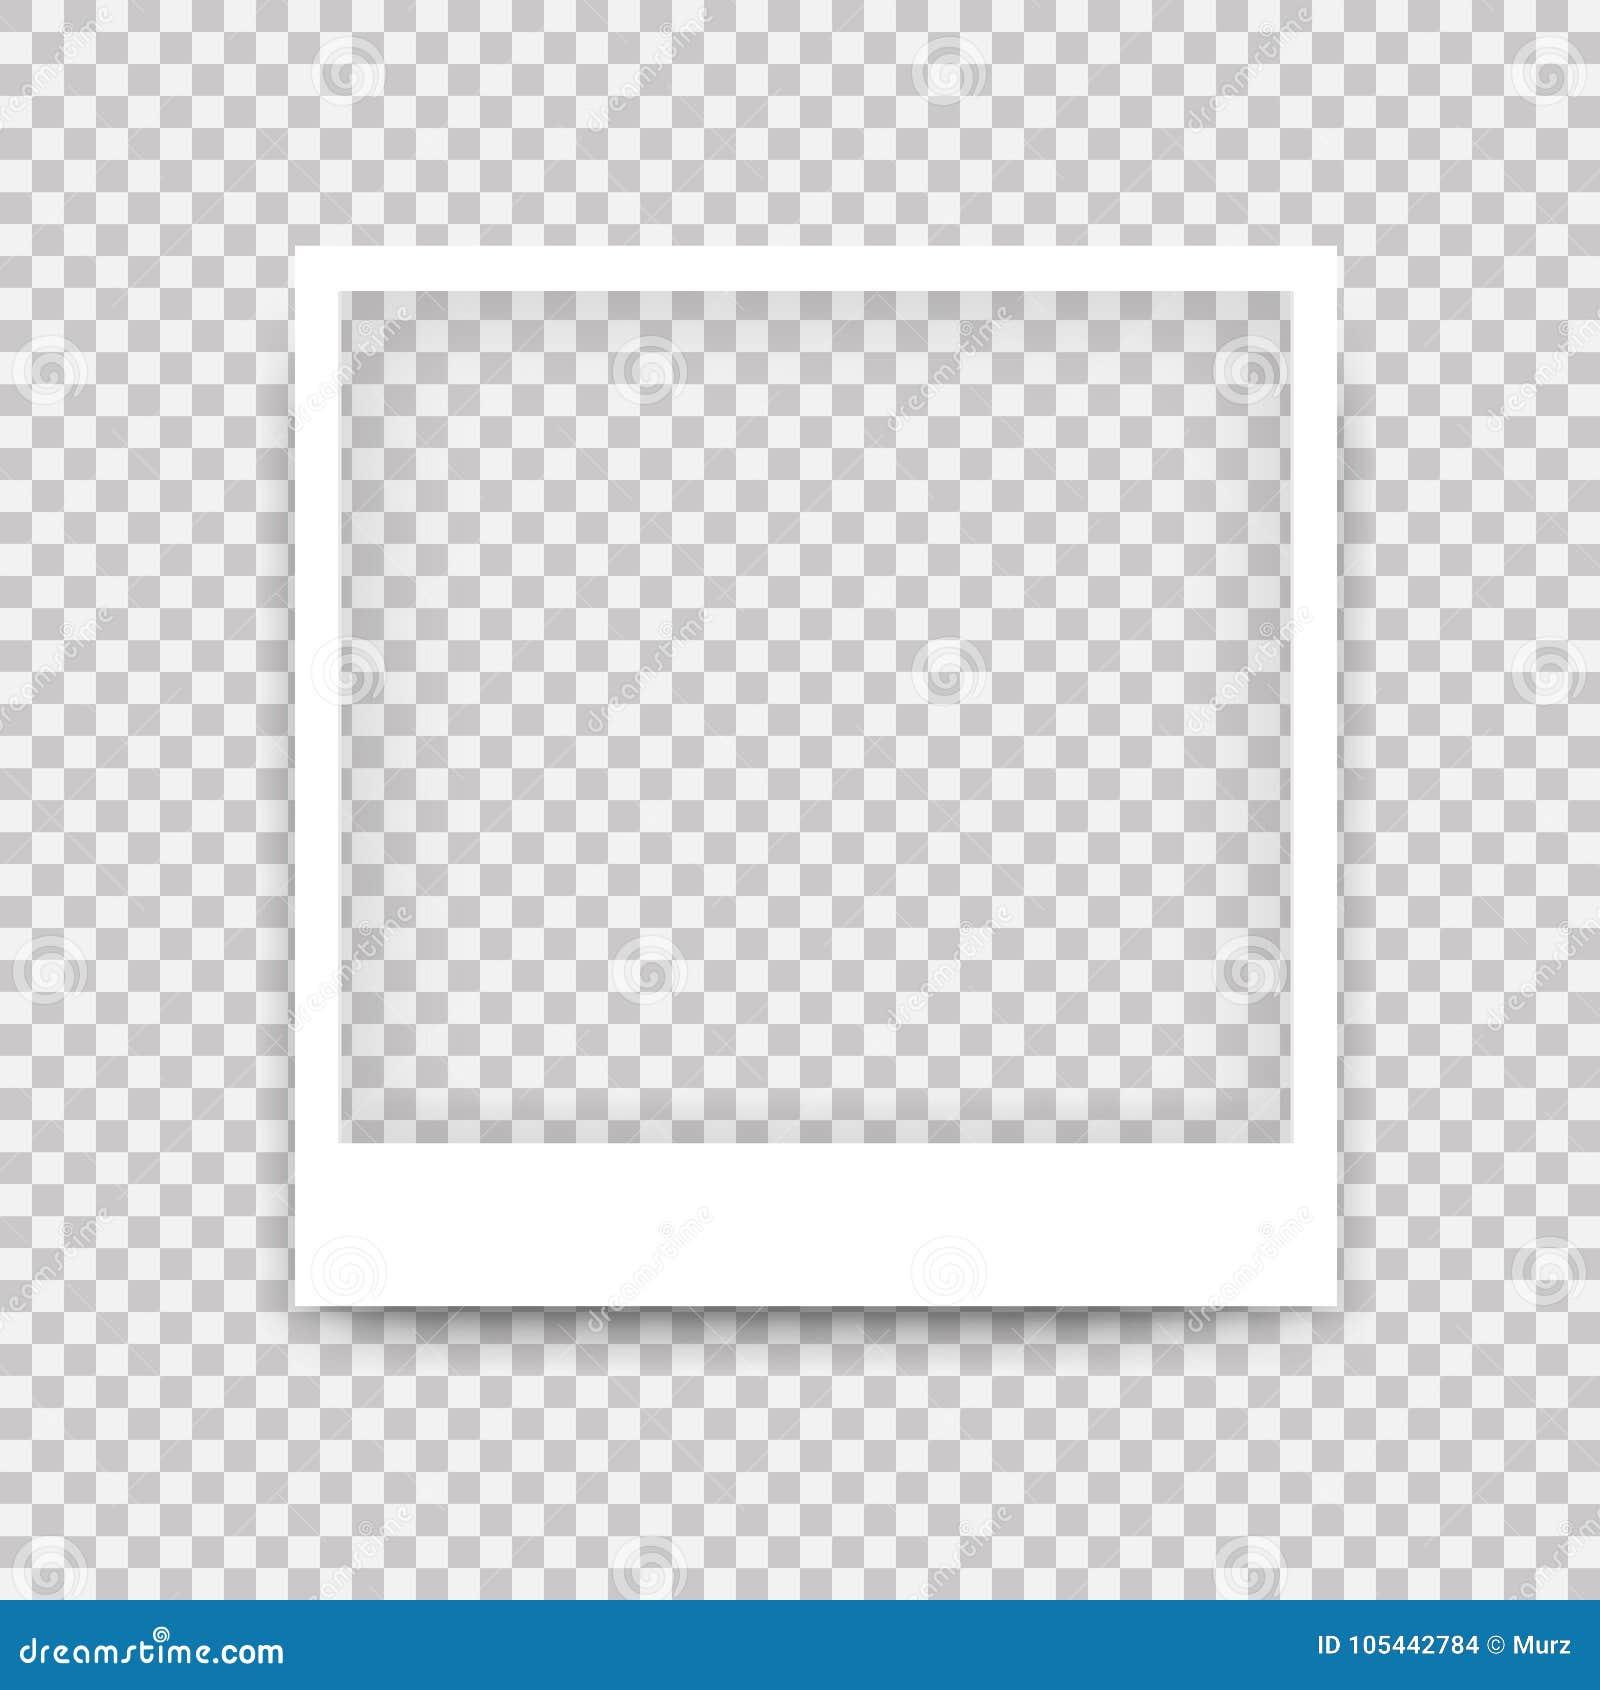 Vector Photo frame stock vector. Illustration of foto - 105442784